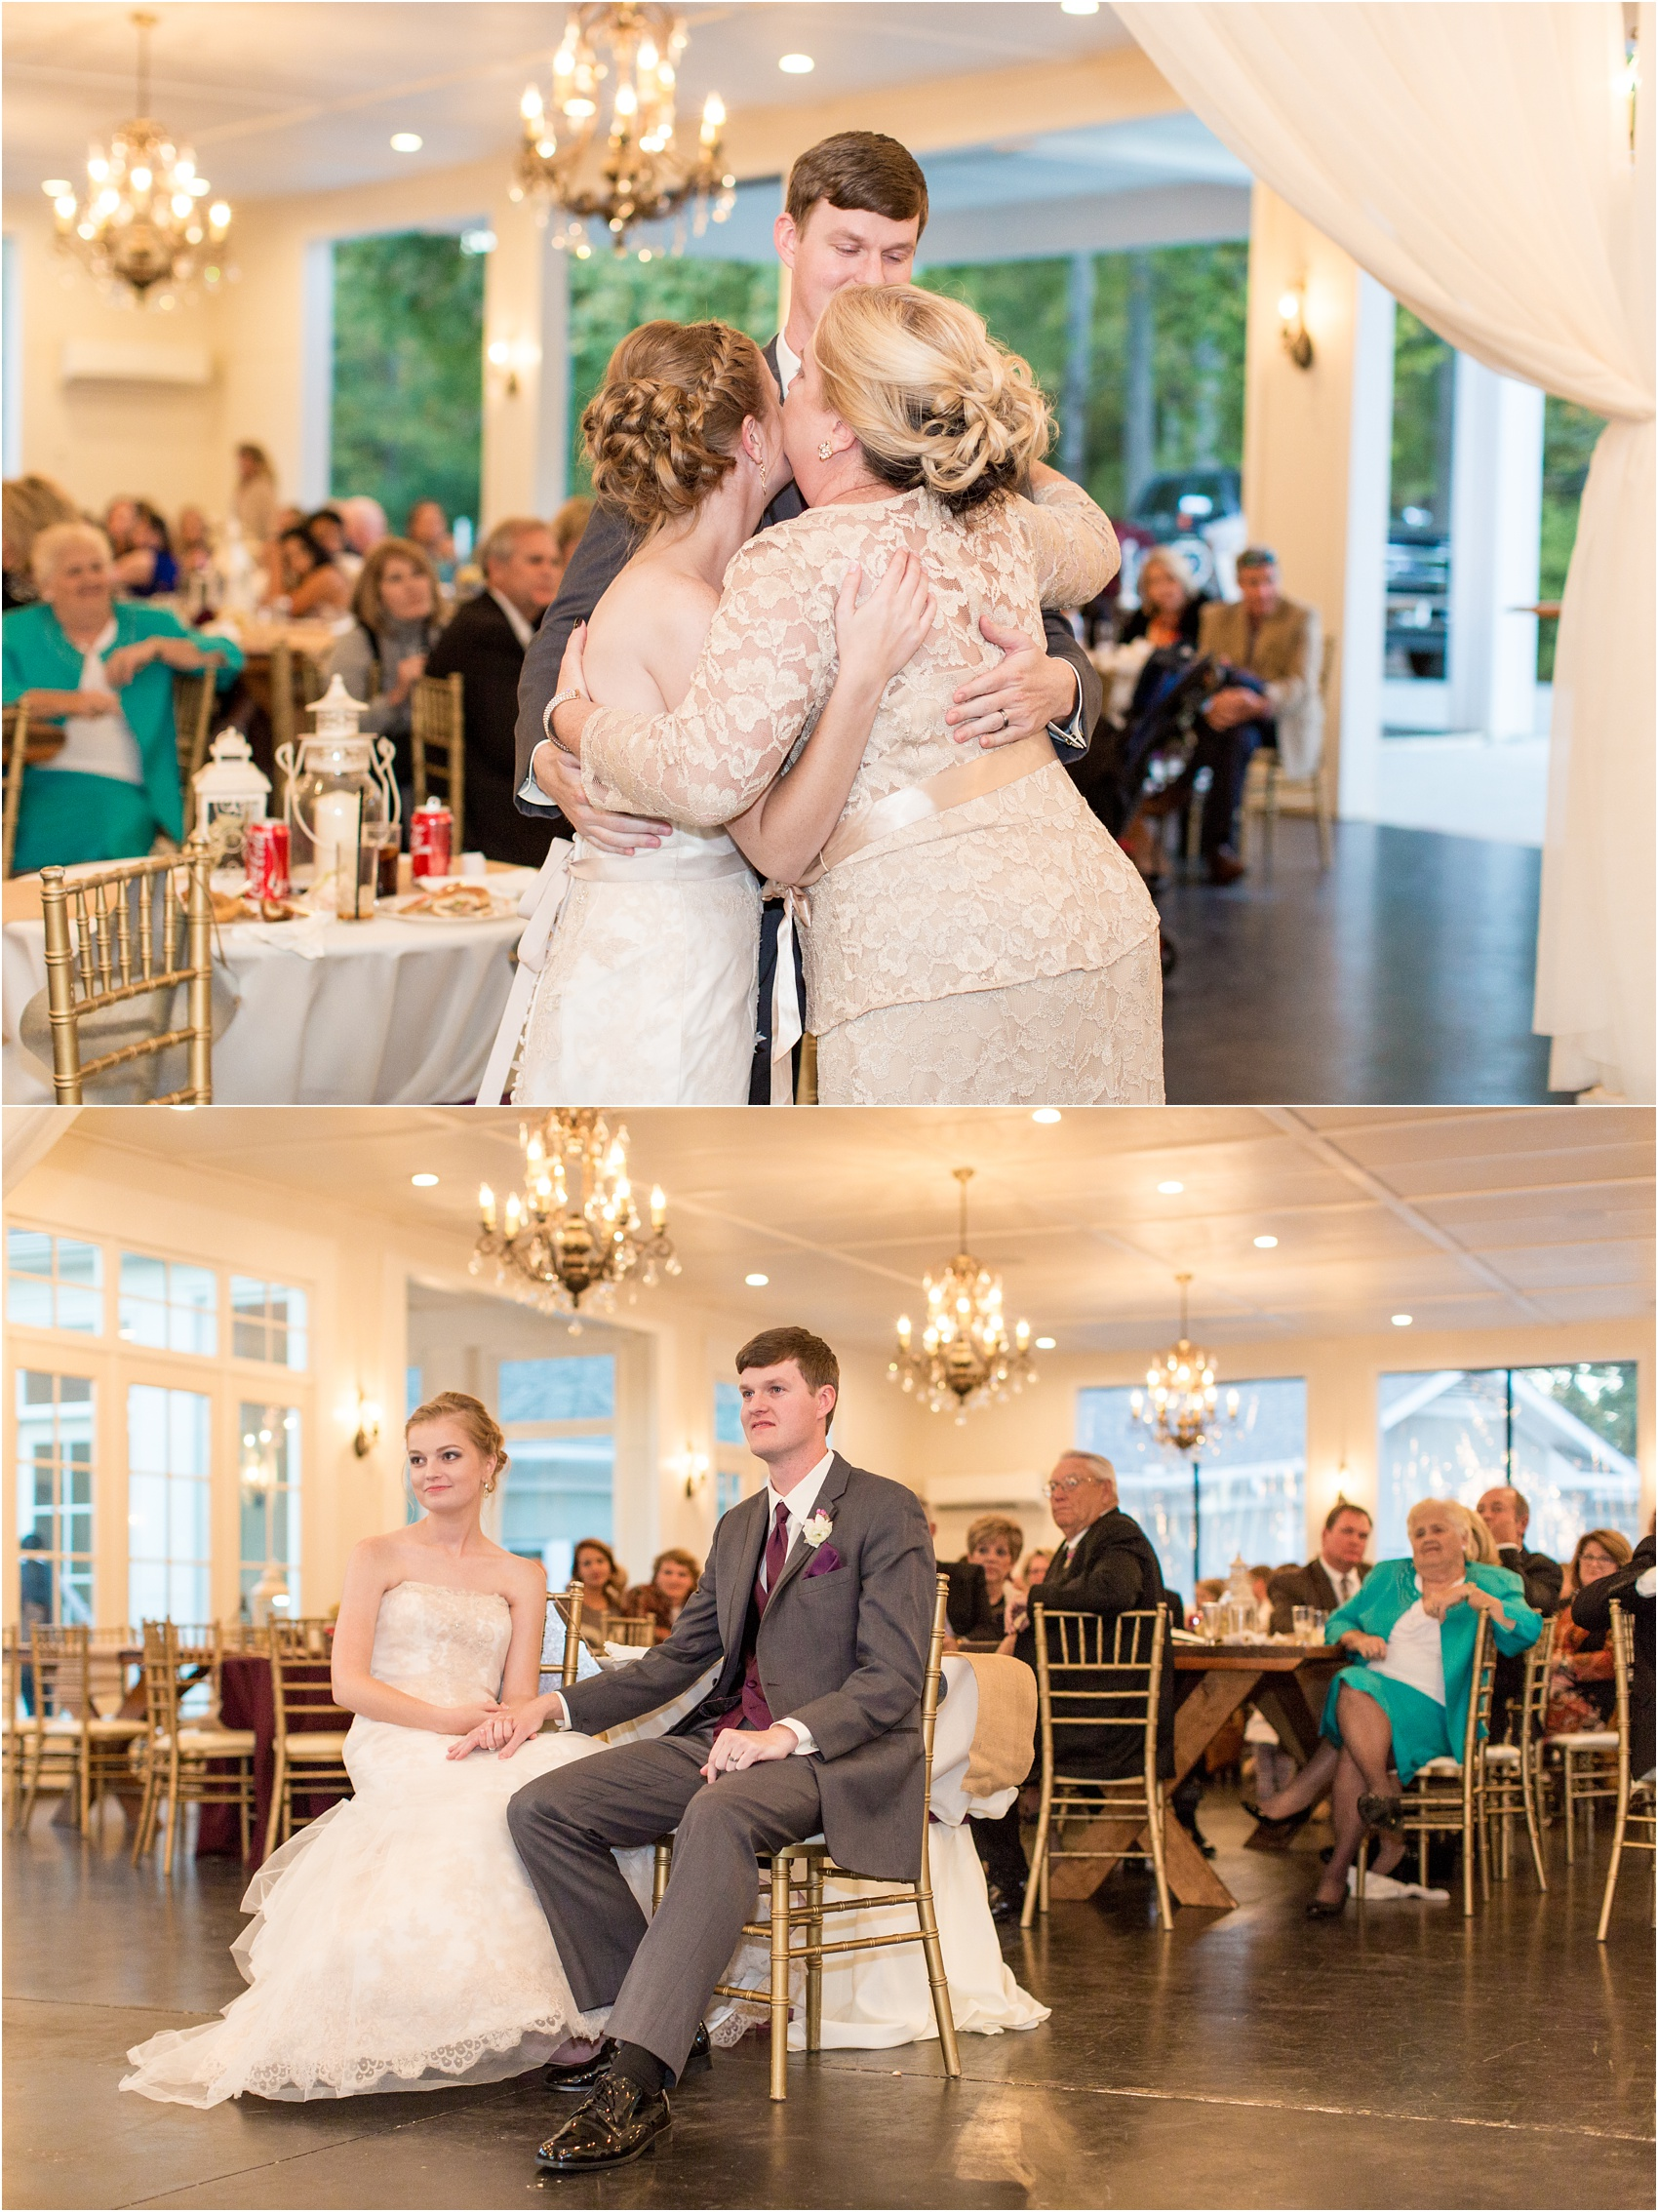 Savannah Eve Photography- Perkins Wedding- Blog-38.jpg